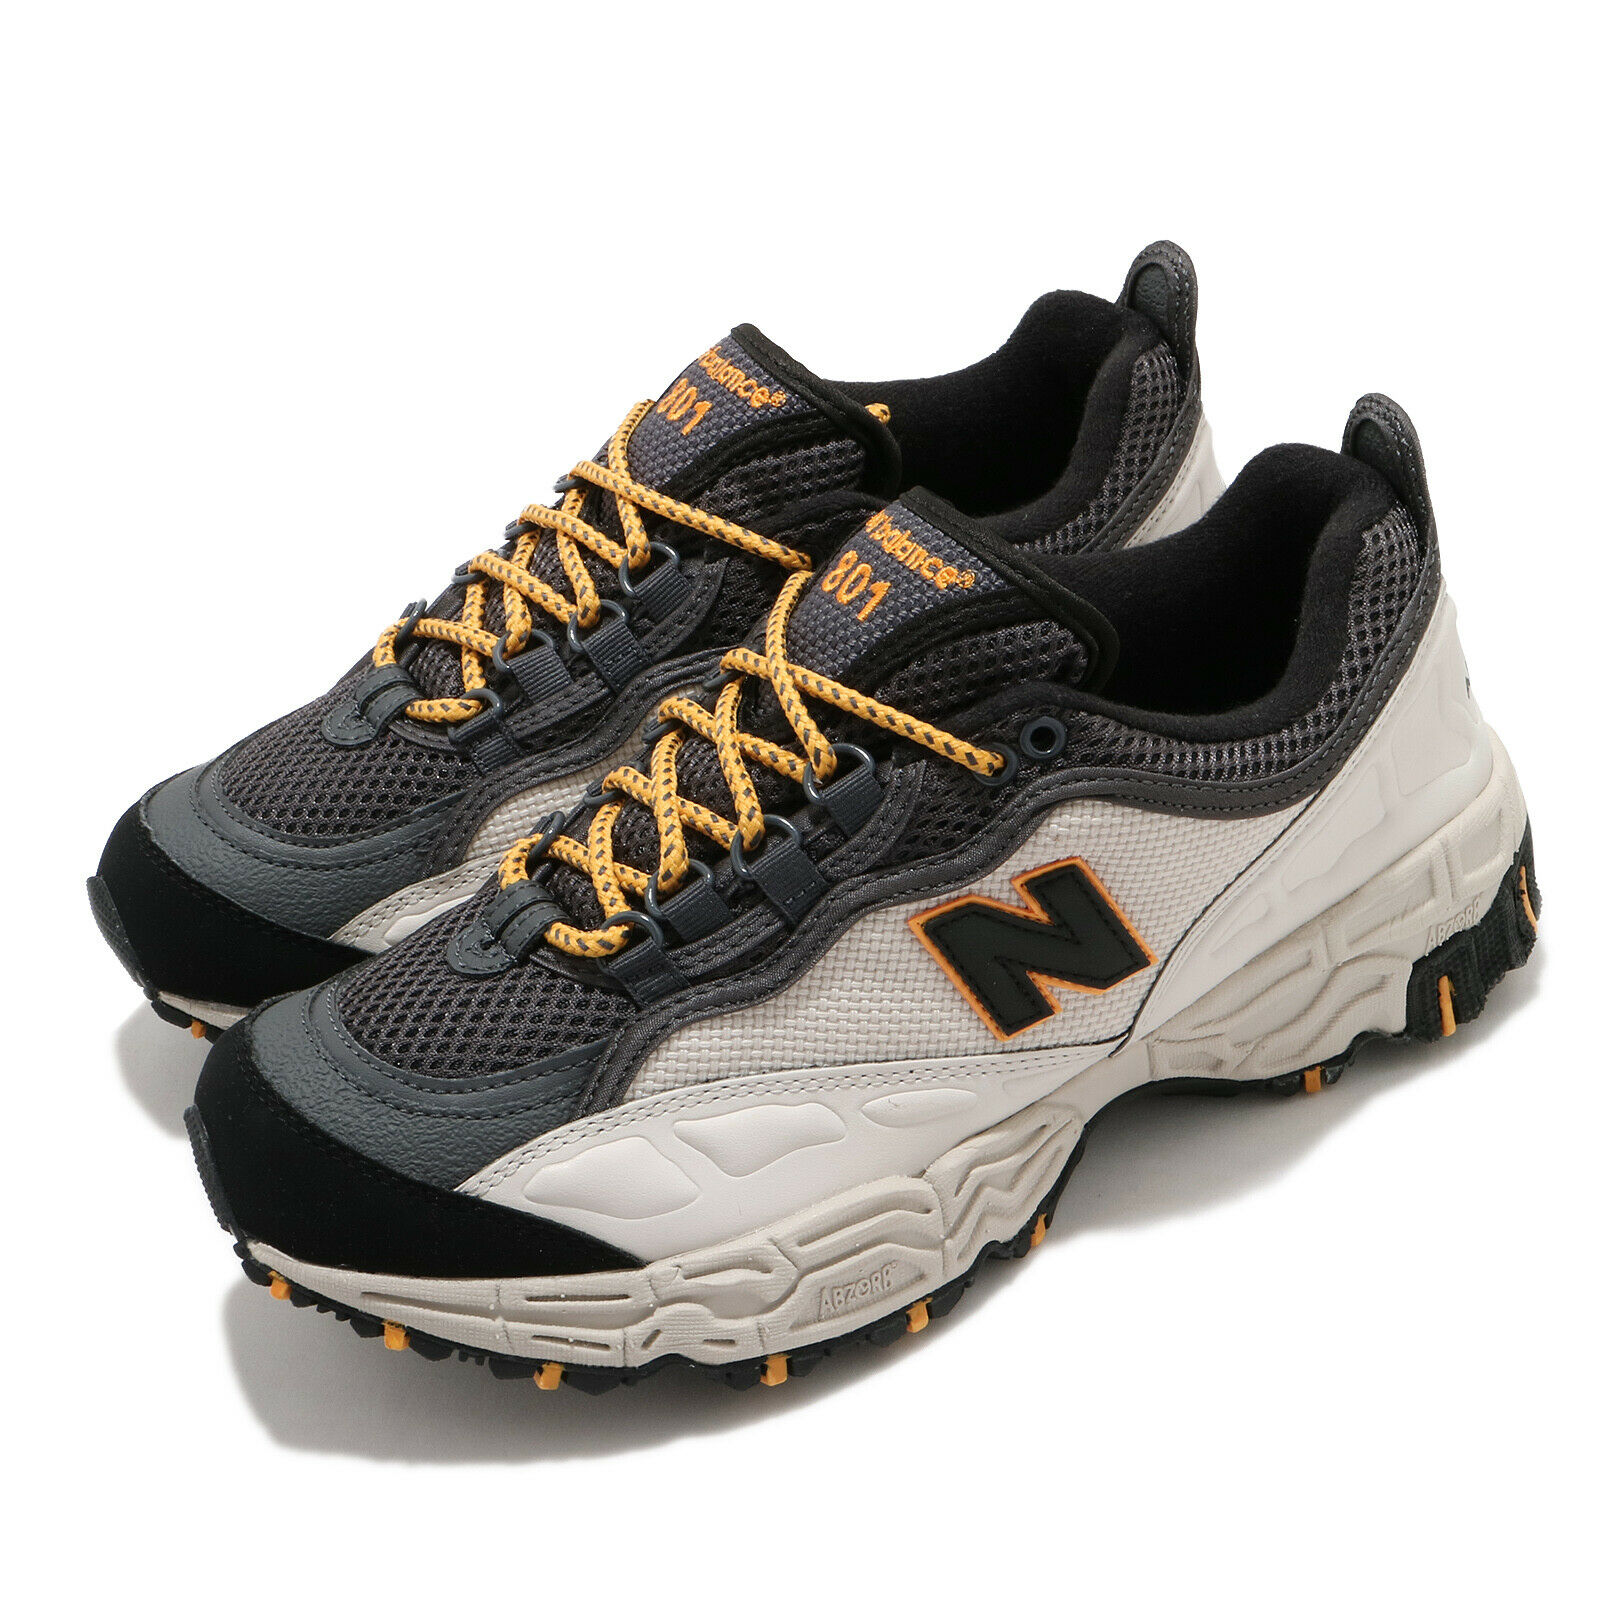 New Balance 801 Beige Black Yellow Grey Men Trail Running Lifestyle ML801NCY D